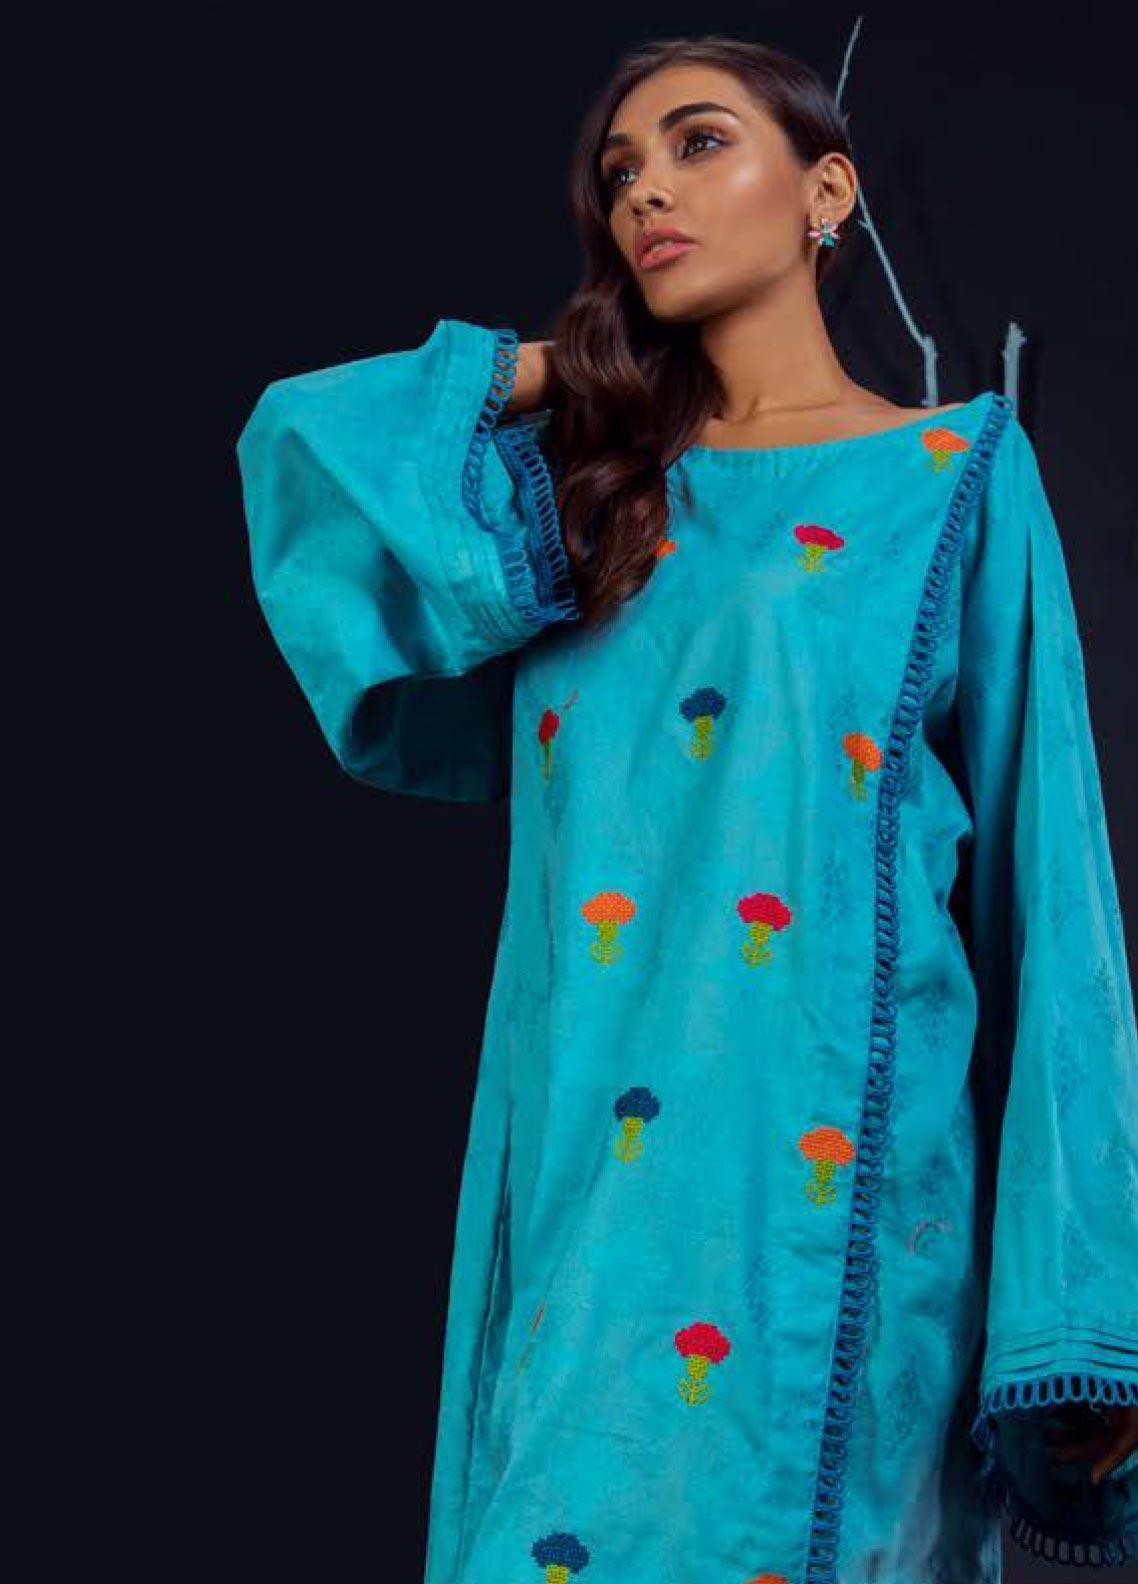 Orient Textile Embroidered Karandi Unstitched Kurties OT19W 231 STEEL B - Winter Collection